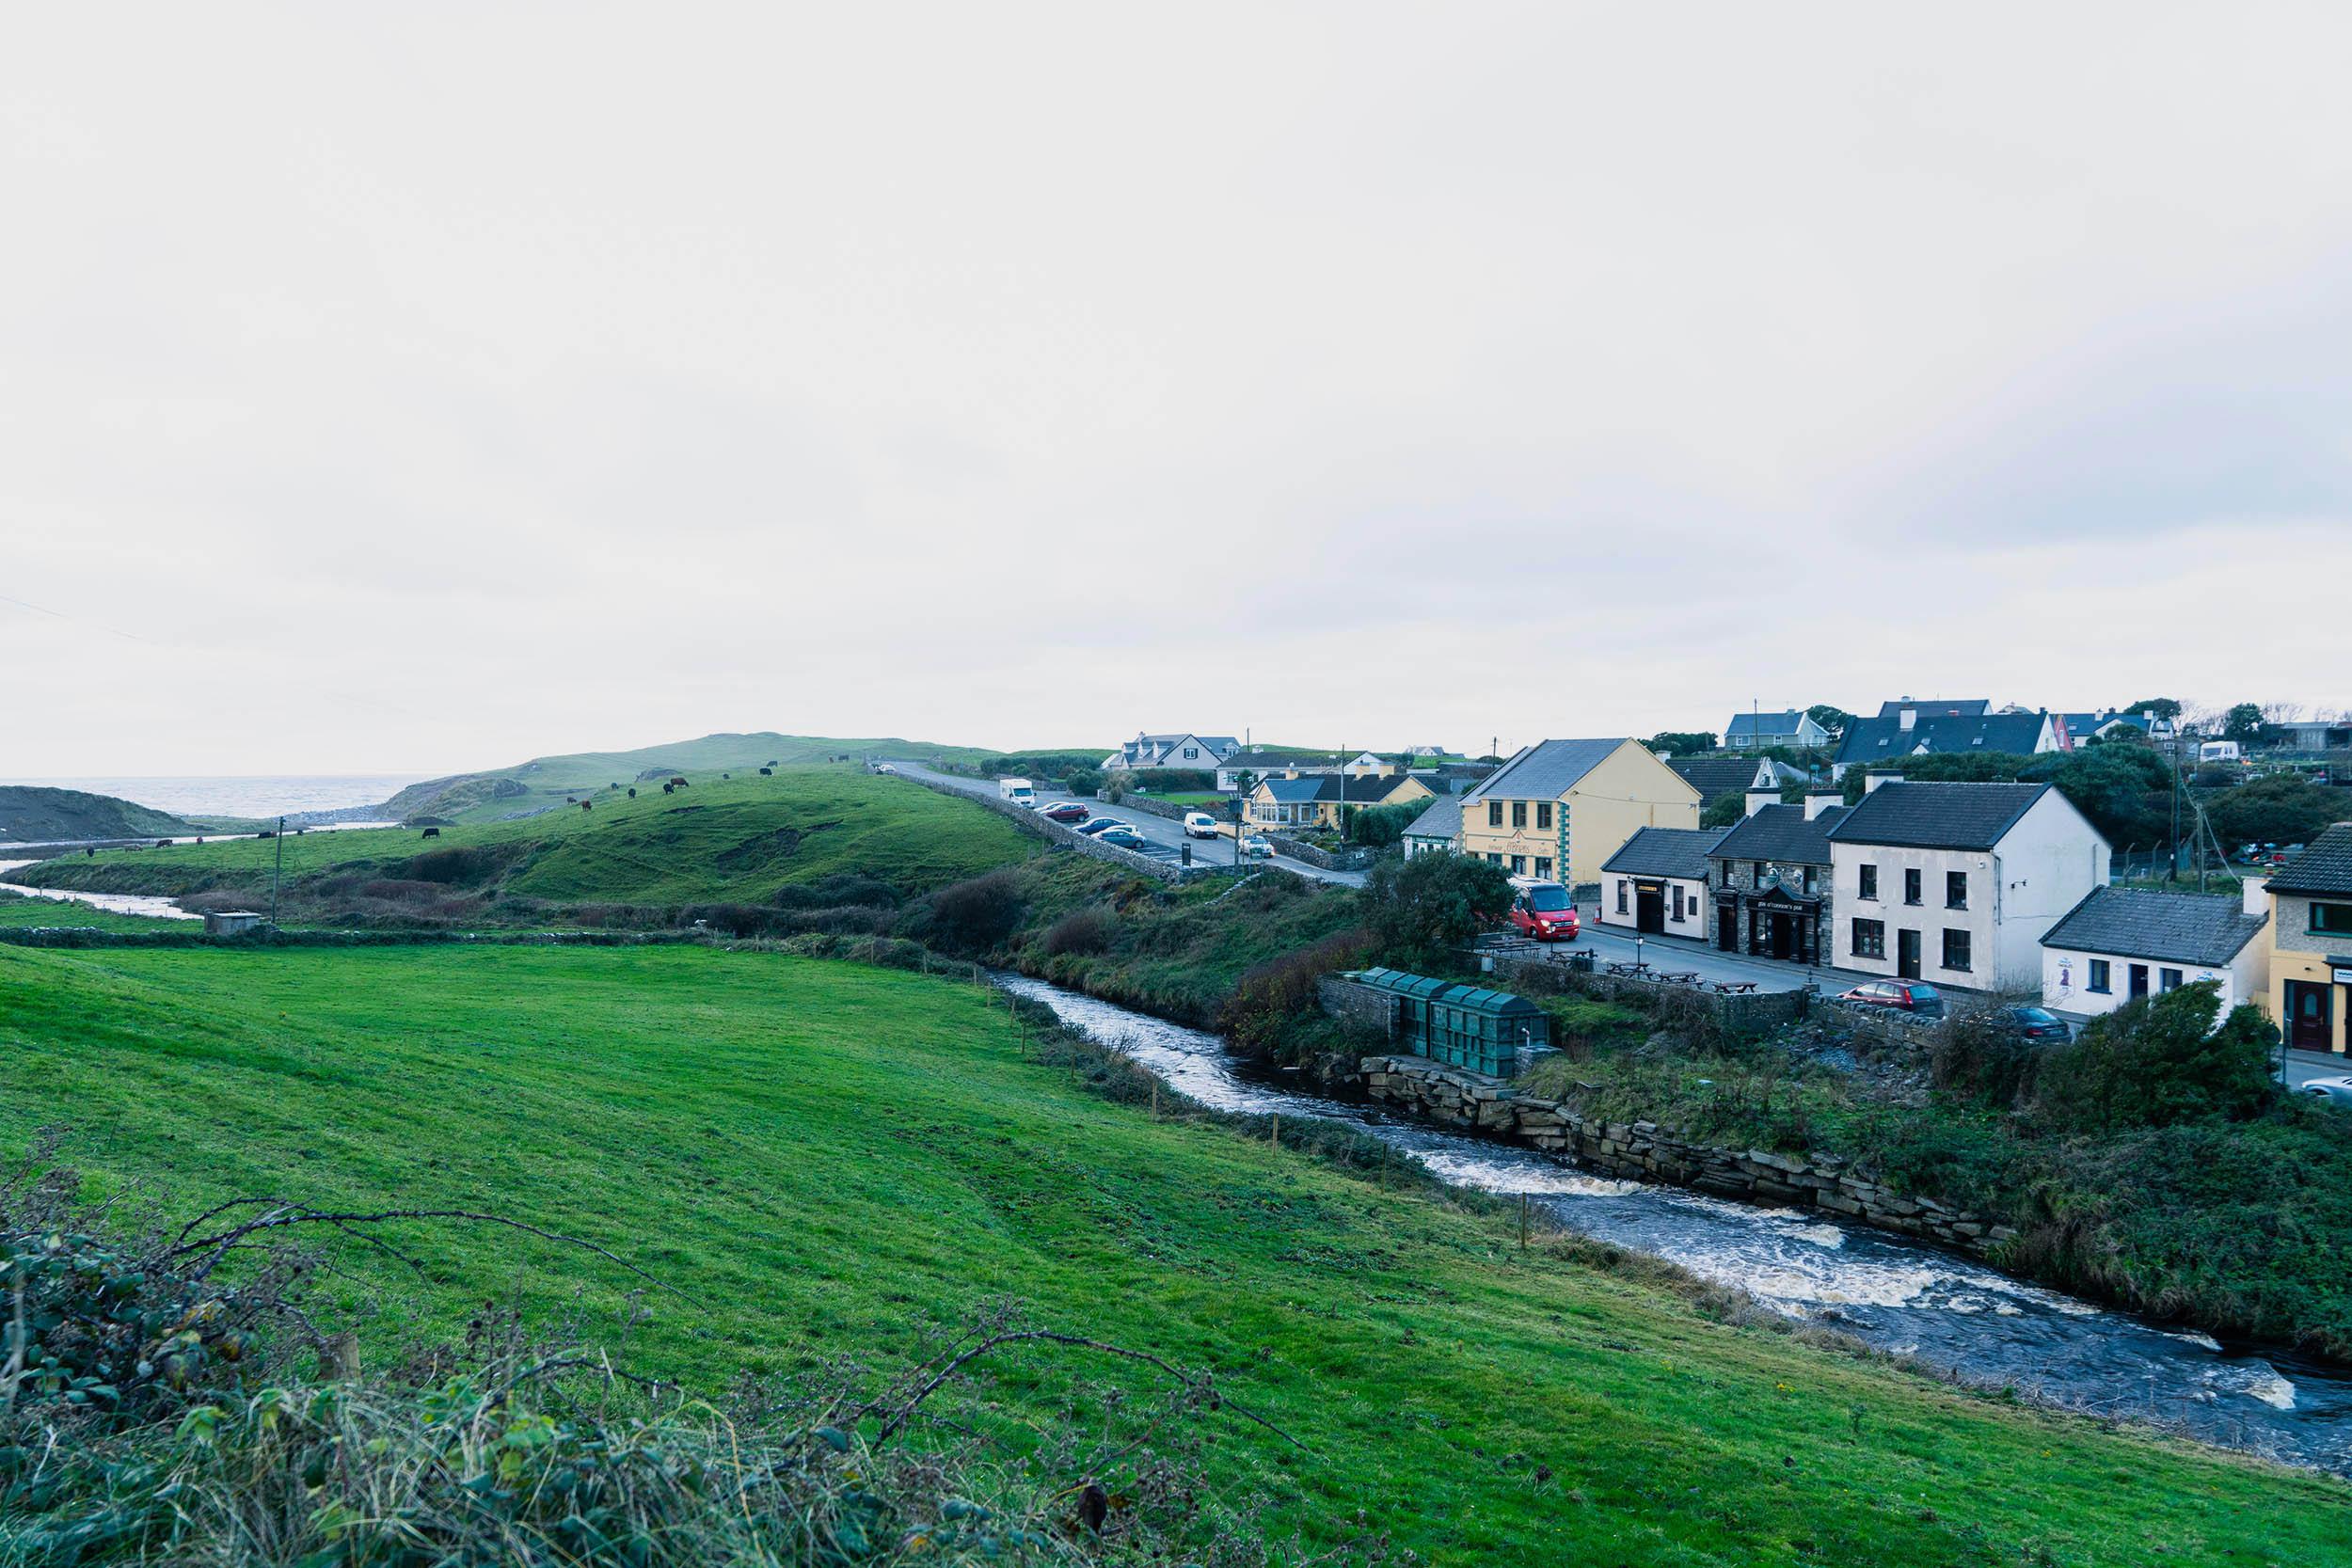 IRELAND_CLARE_DOOLIN_0023